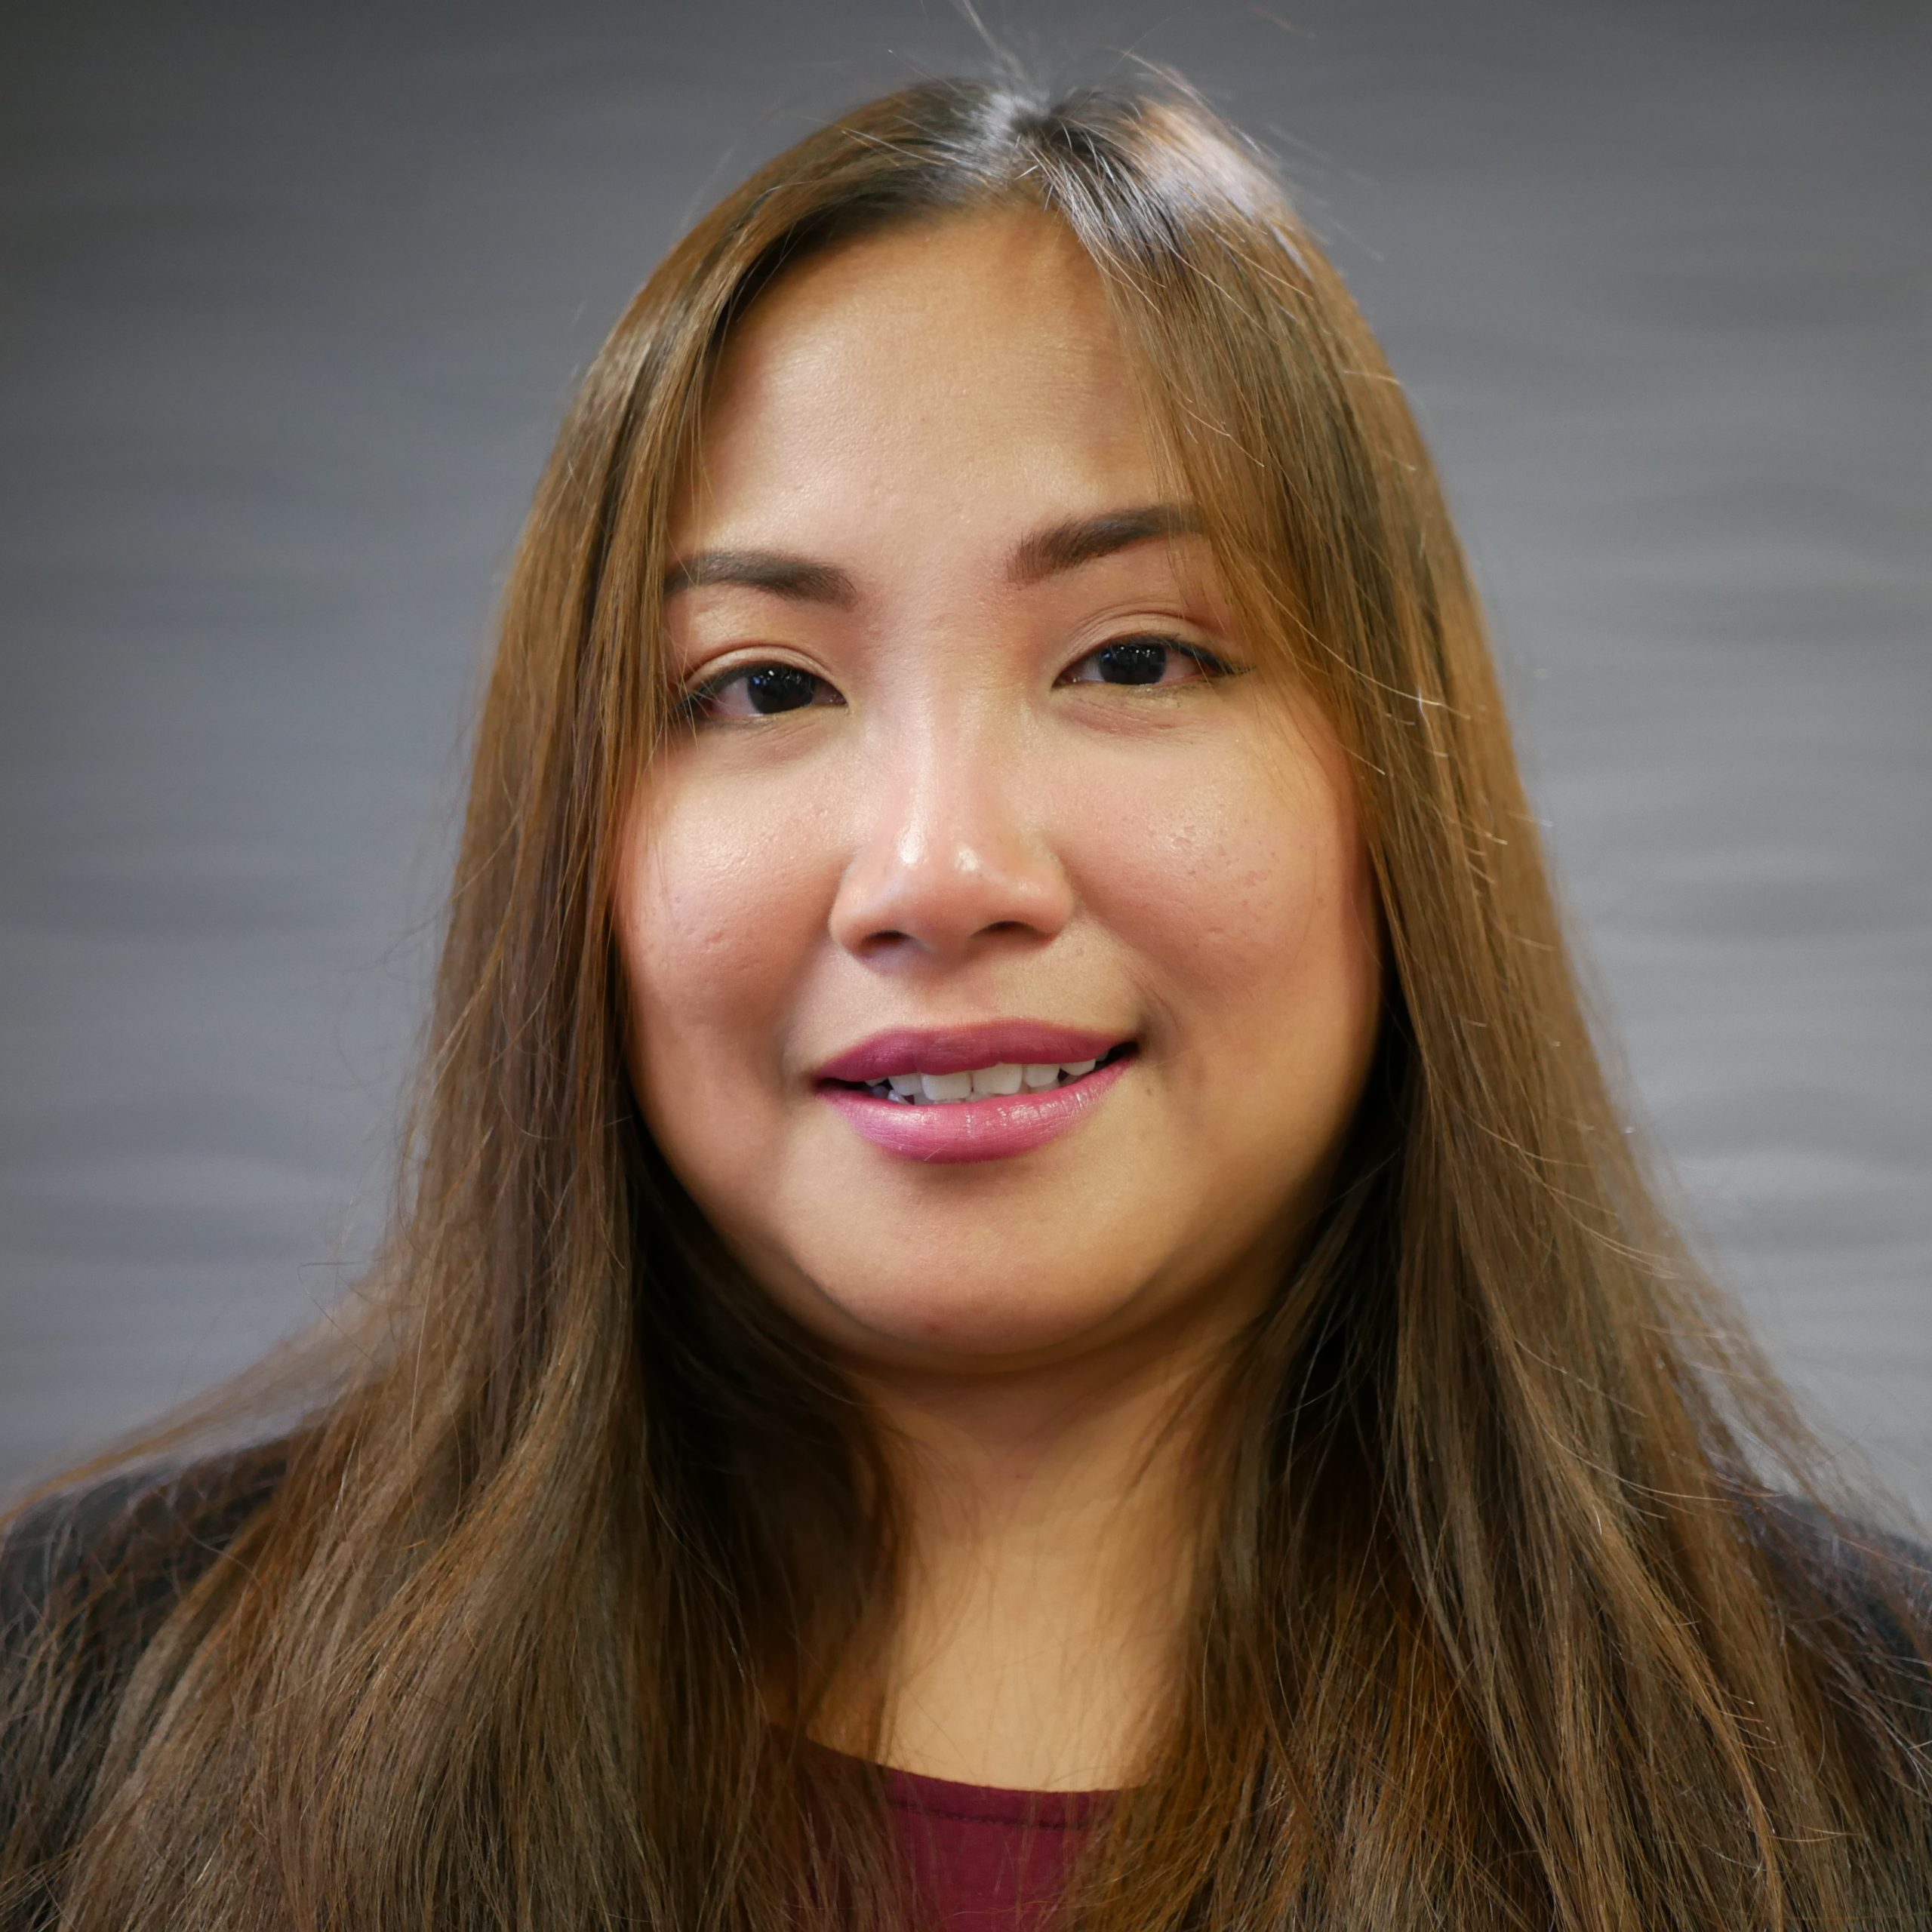 Marjorie Balingit